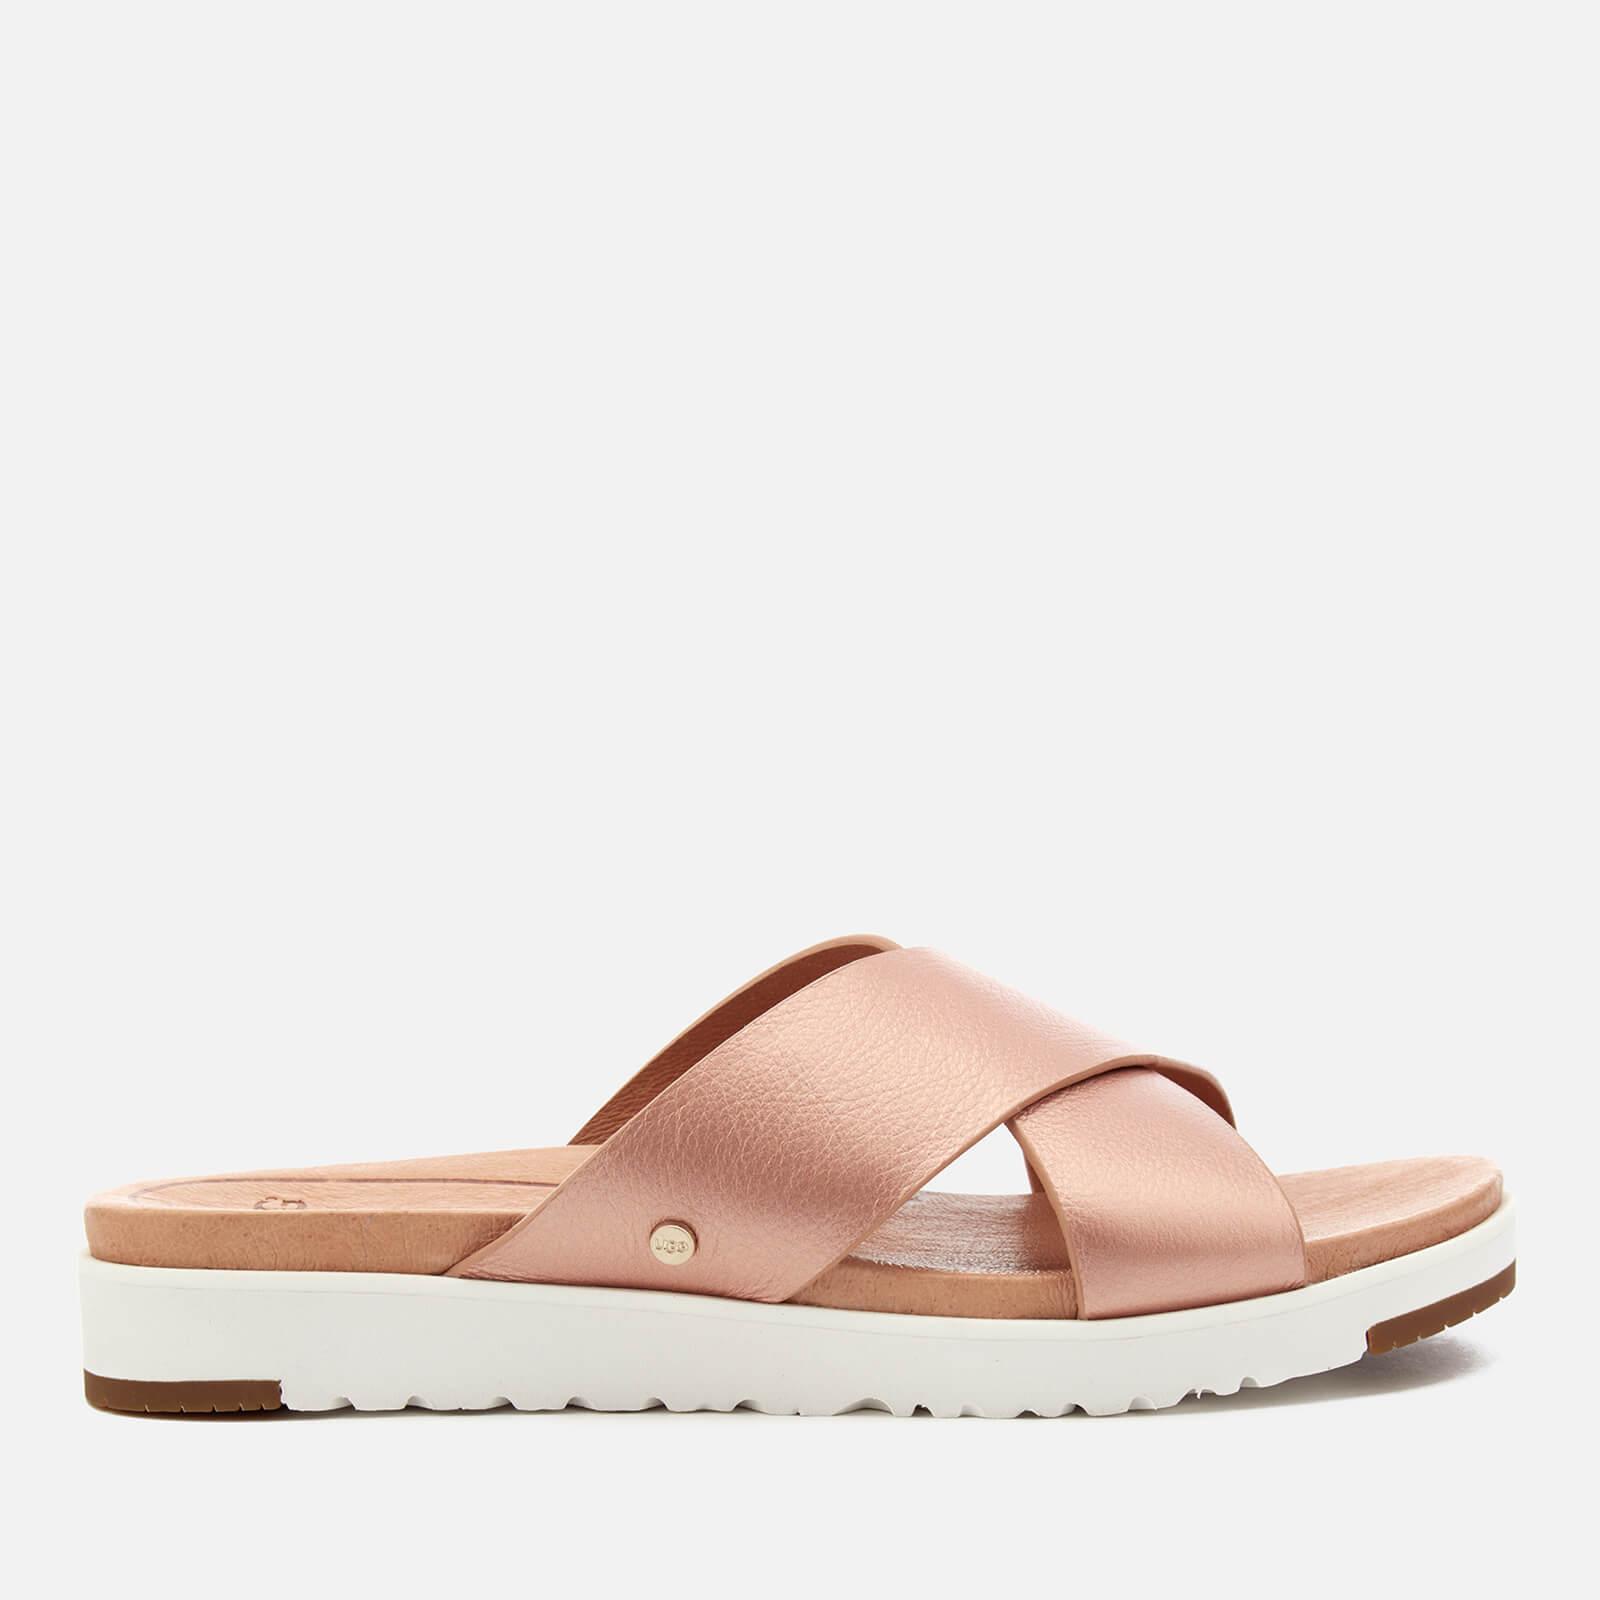 bd59f8224a87 UGG Kari Metallic Cross Strap Slide Sandals in Pink - Lyst